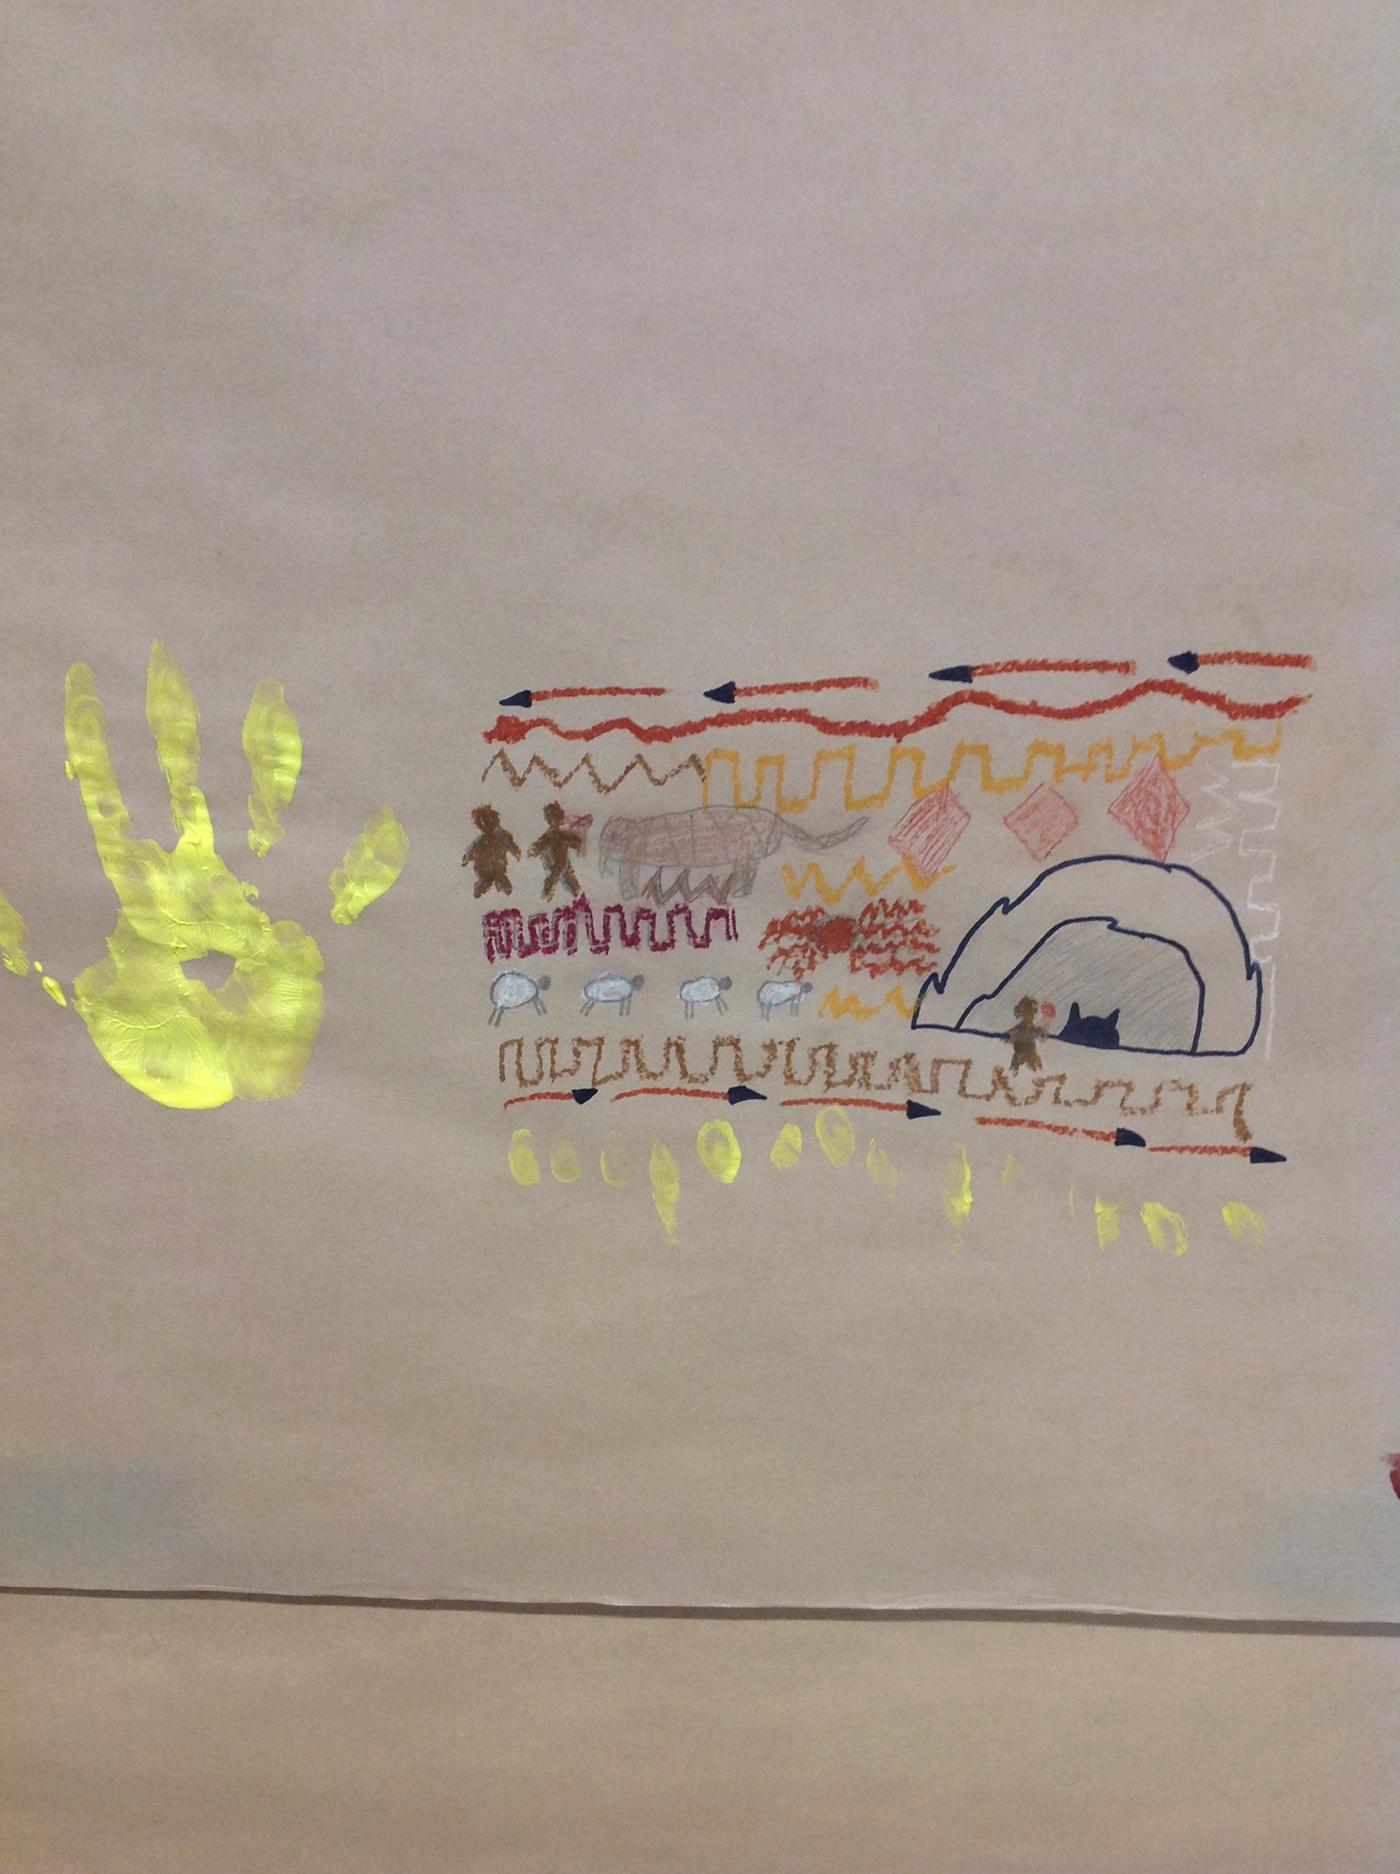 Education Fun kids Murals summer camp